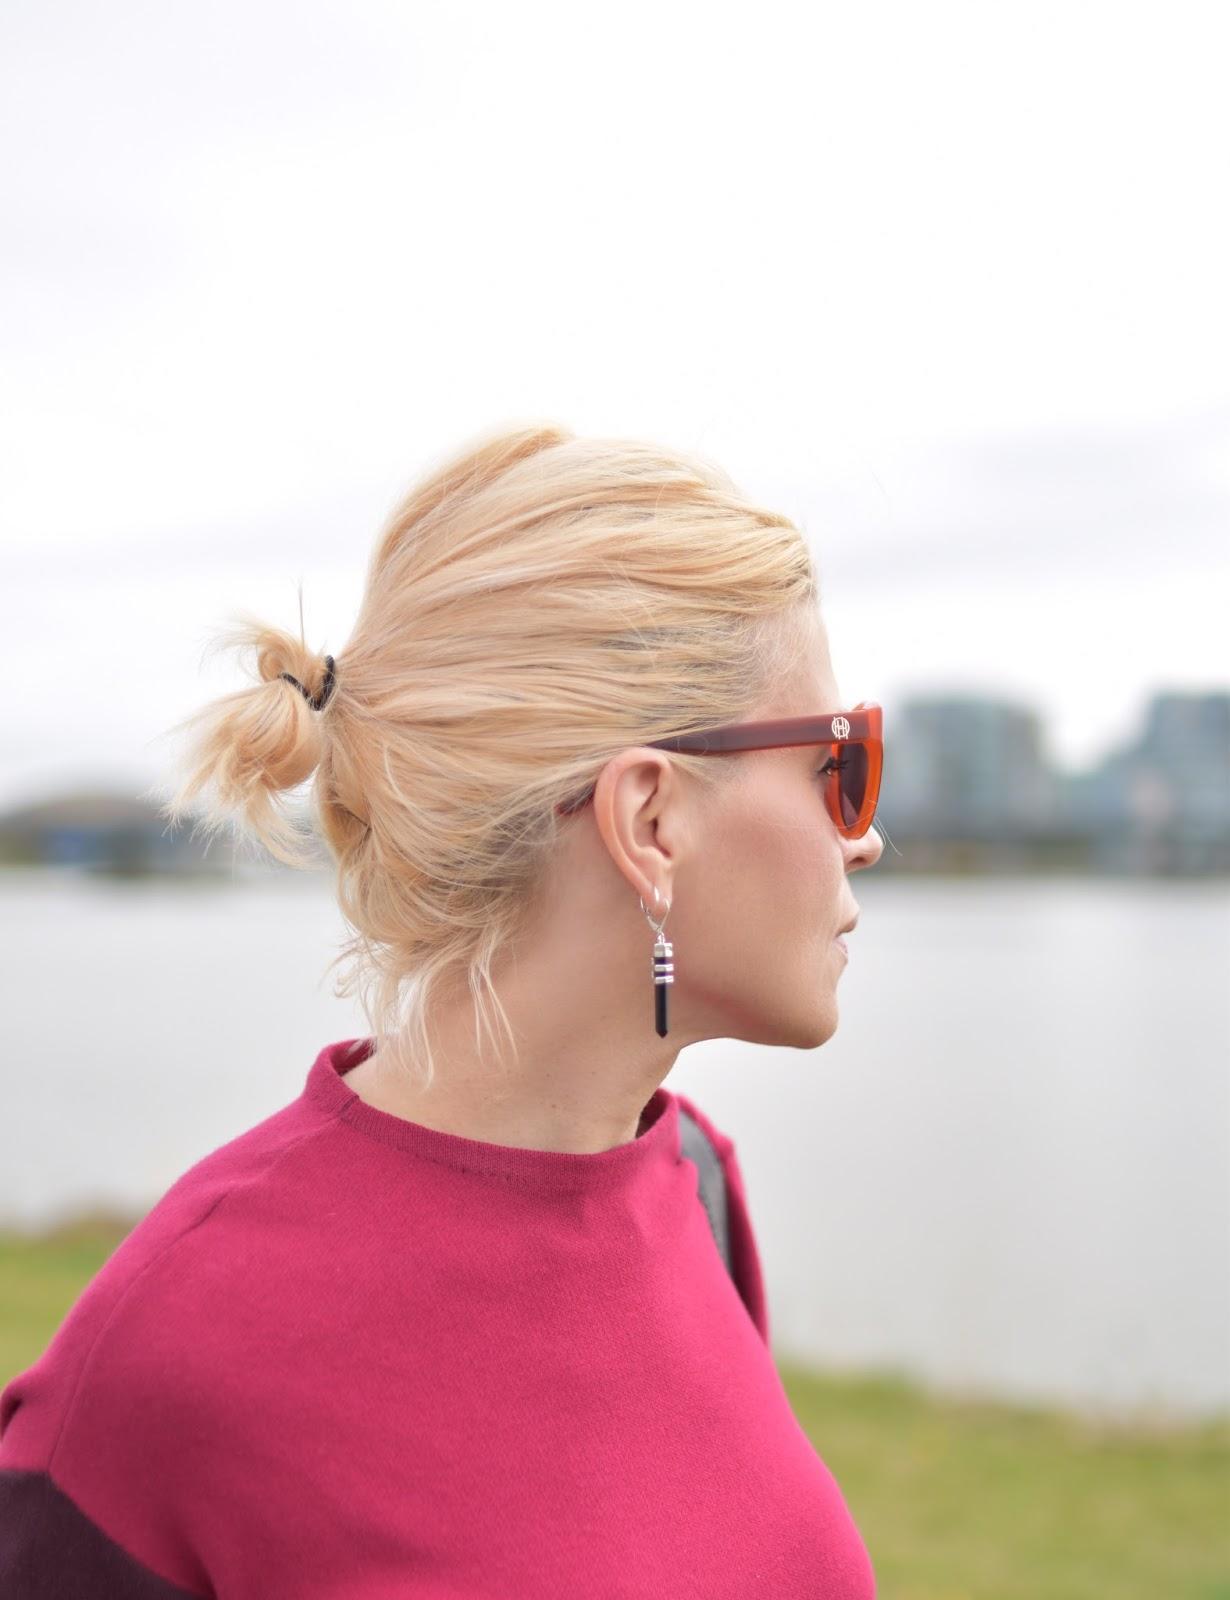 Gen X outfit inspiration c/o Monika Faulkner